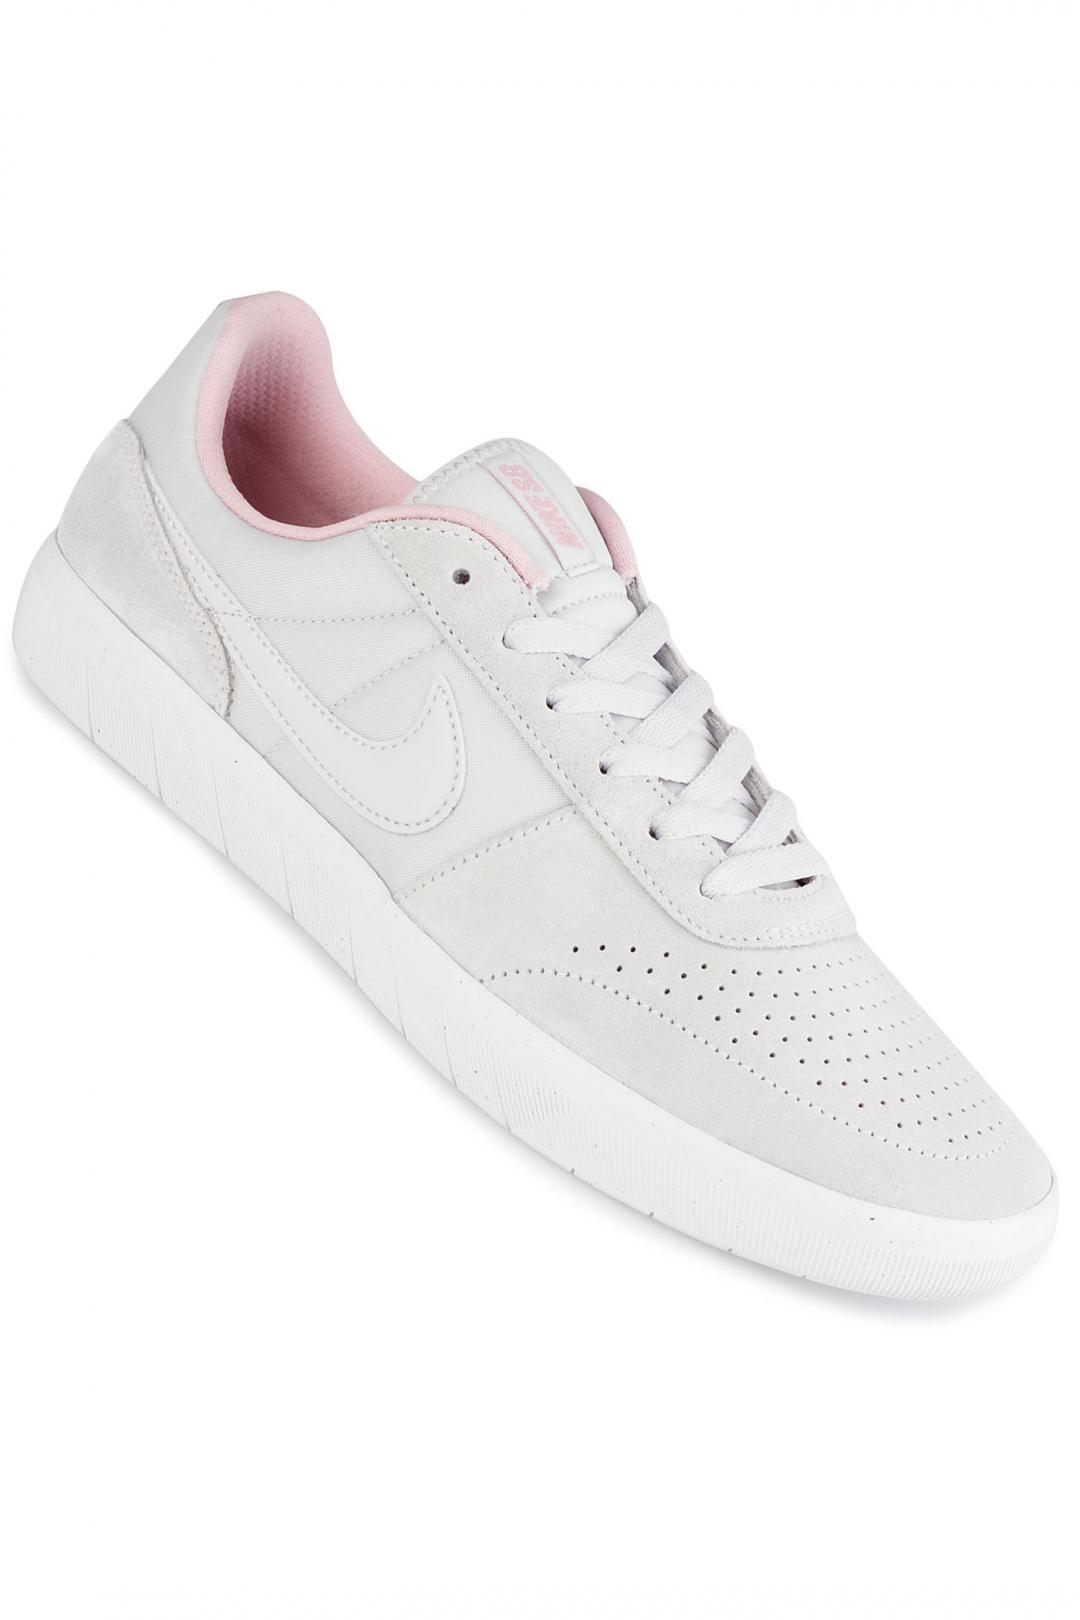 Uomo Nike SB Team Classic vast grey white | Scarpe da skate